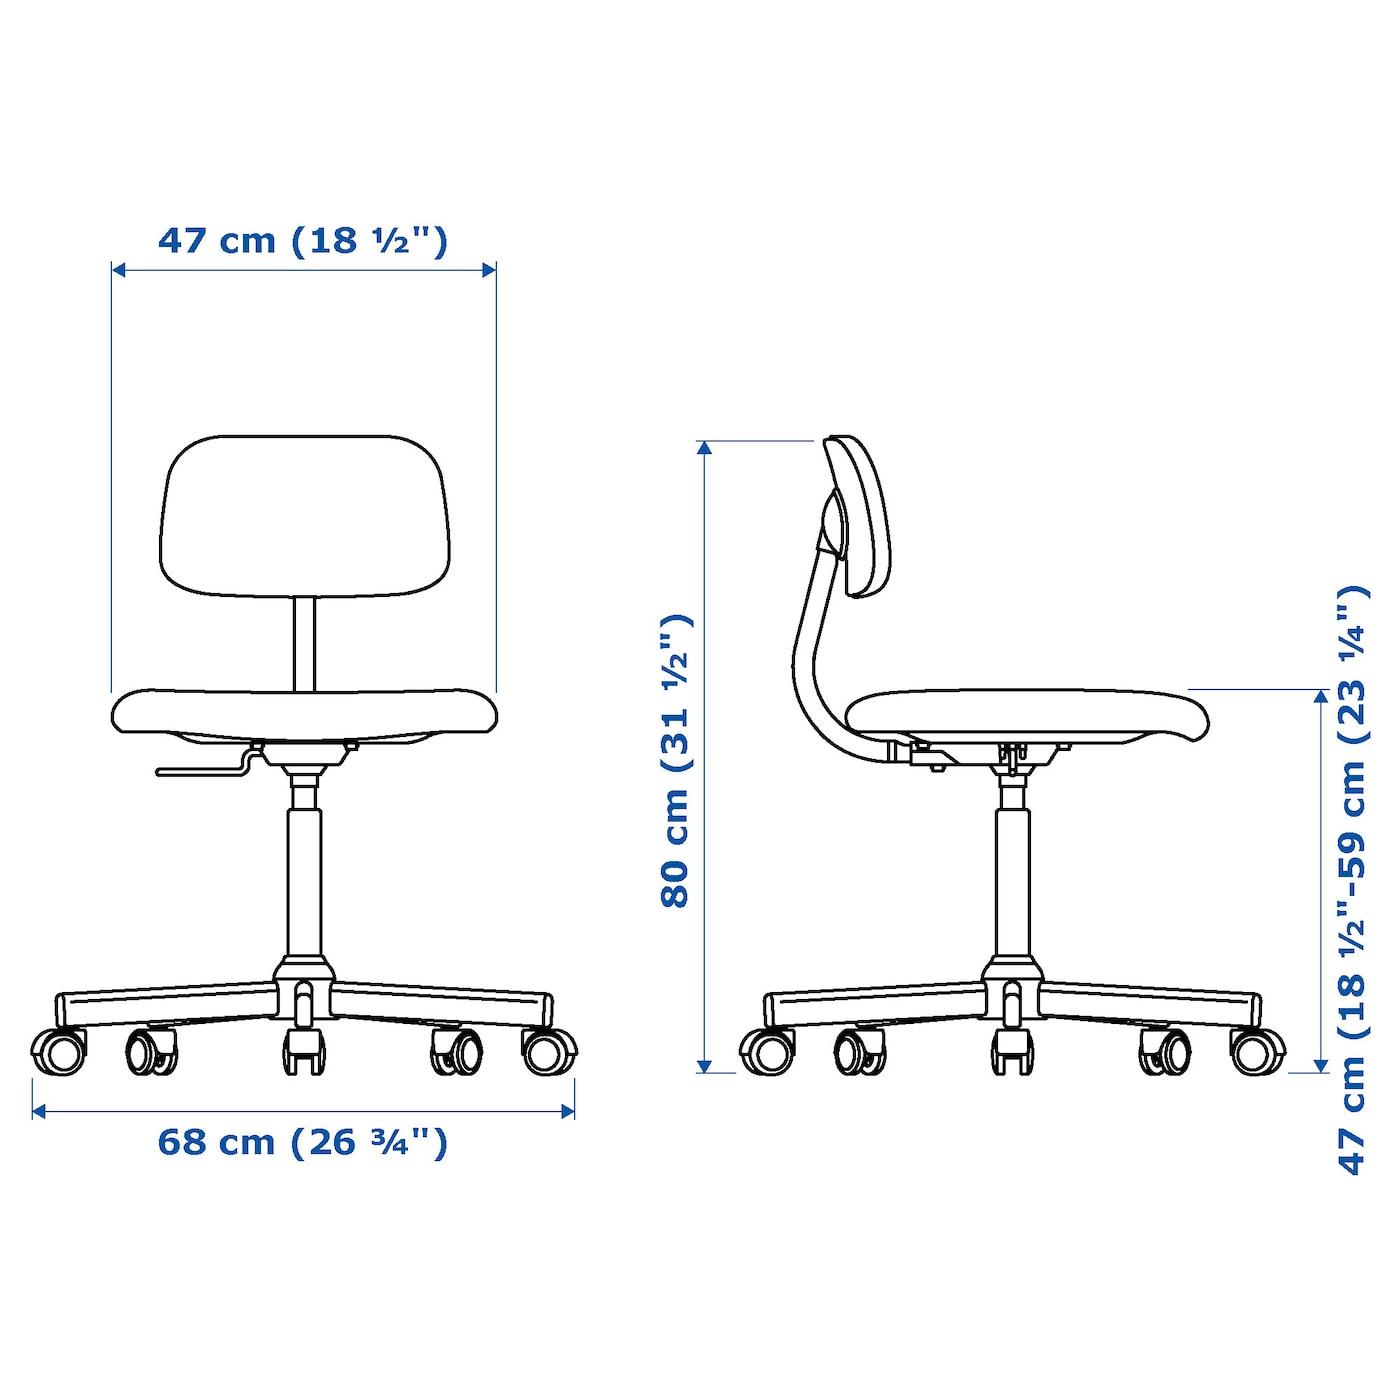 Bleckberget Swivel Chair Idekulla Beige